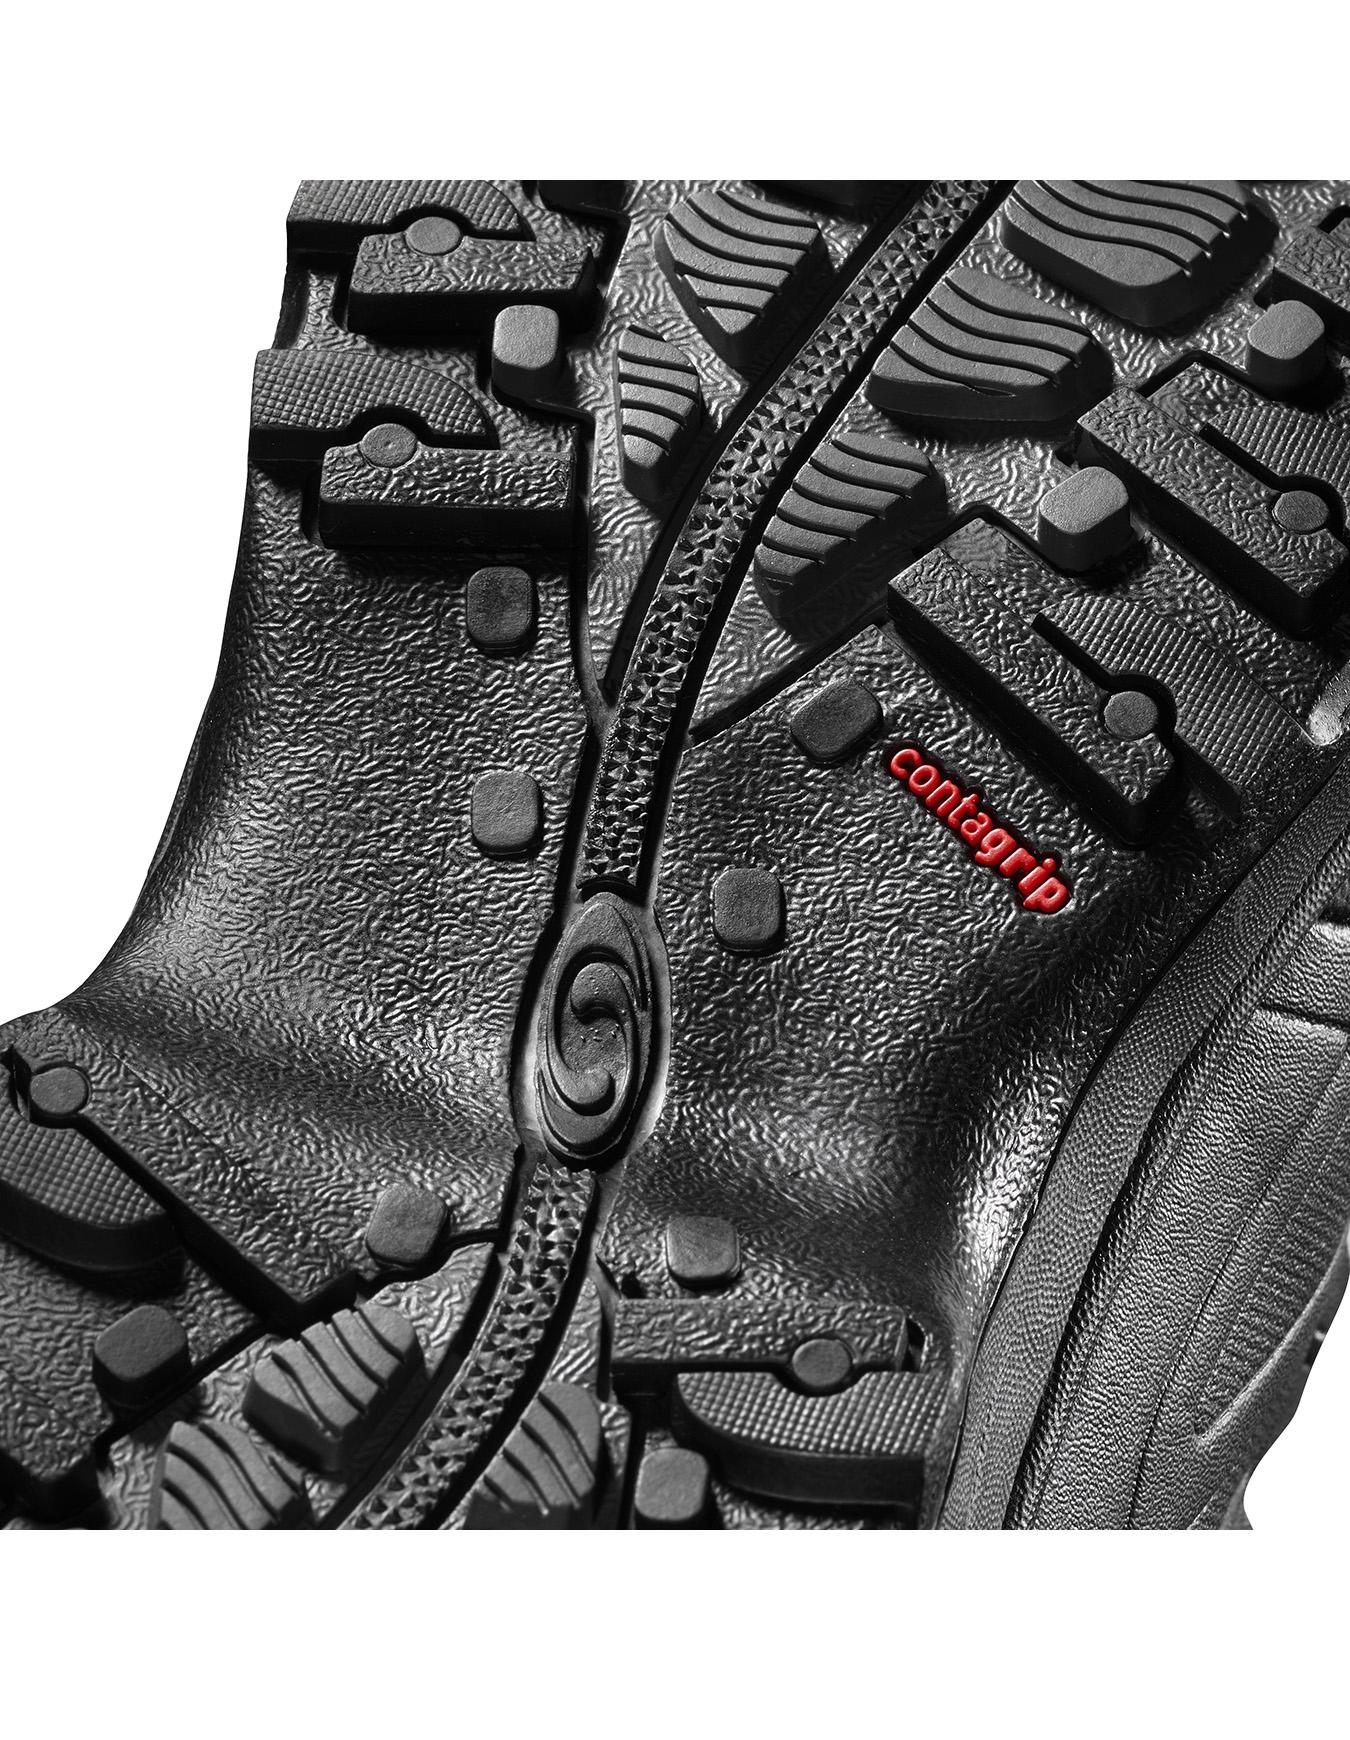 Salomon Toundra Pro CSWP Black/Black/Magnet : Men's Winter Walking Boots : Snowleader